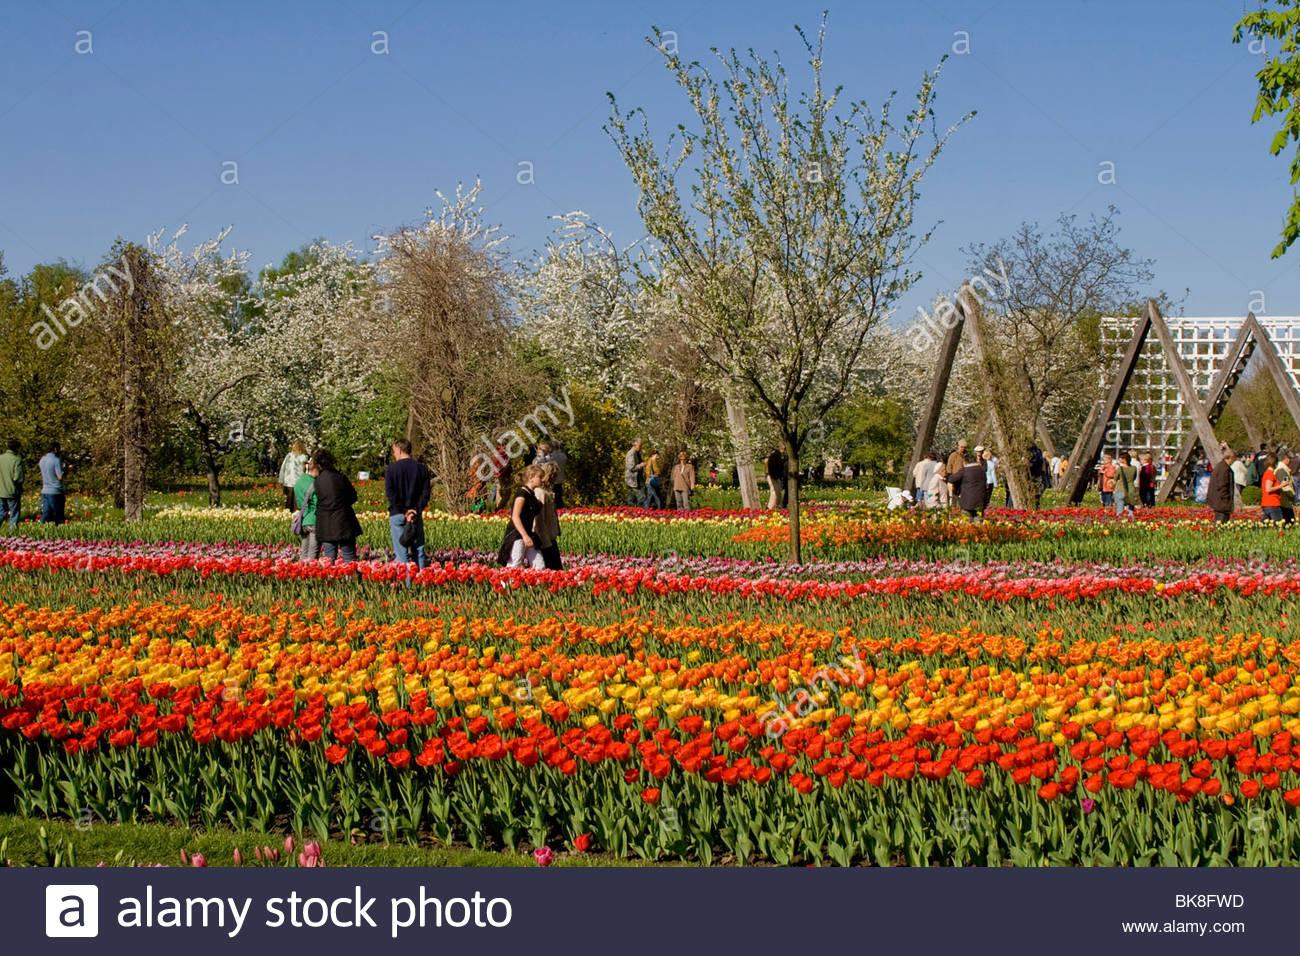 Berlin Britzer Garten Genial Tulipan Stock S & Tulipan Stock Page 2 Alamy